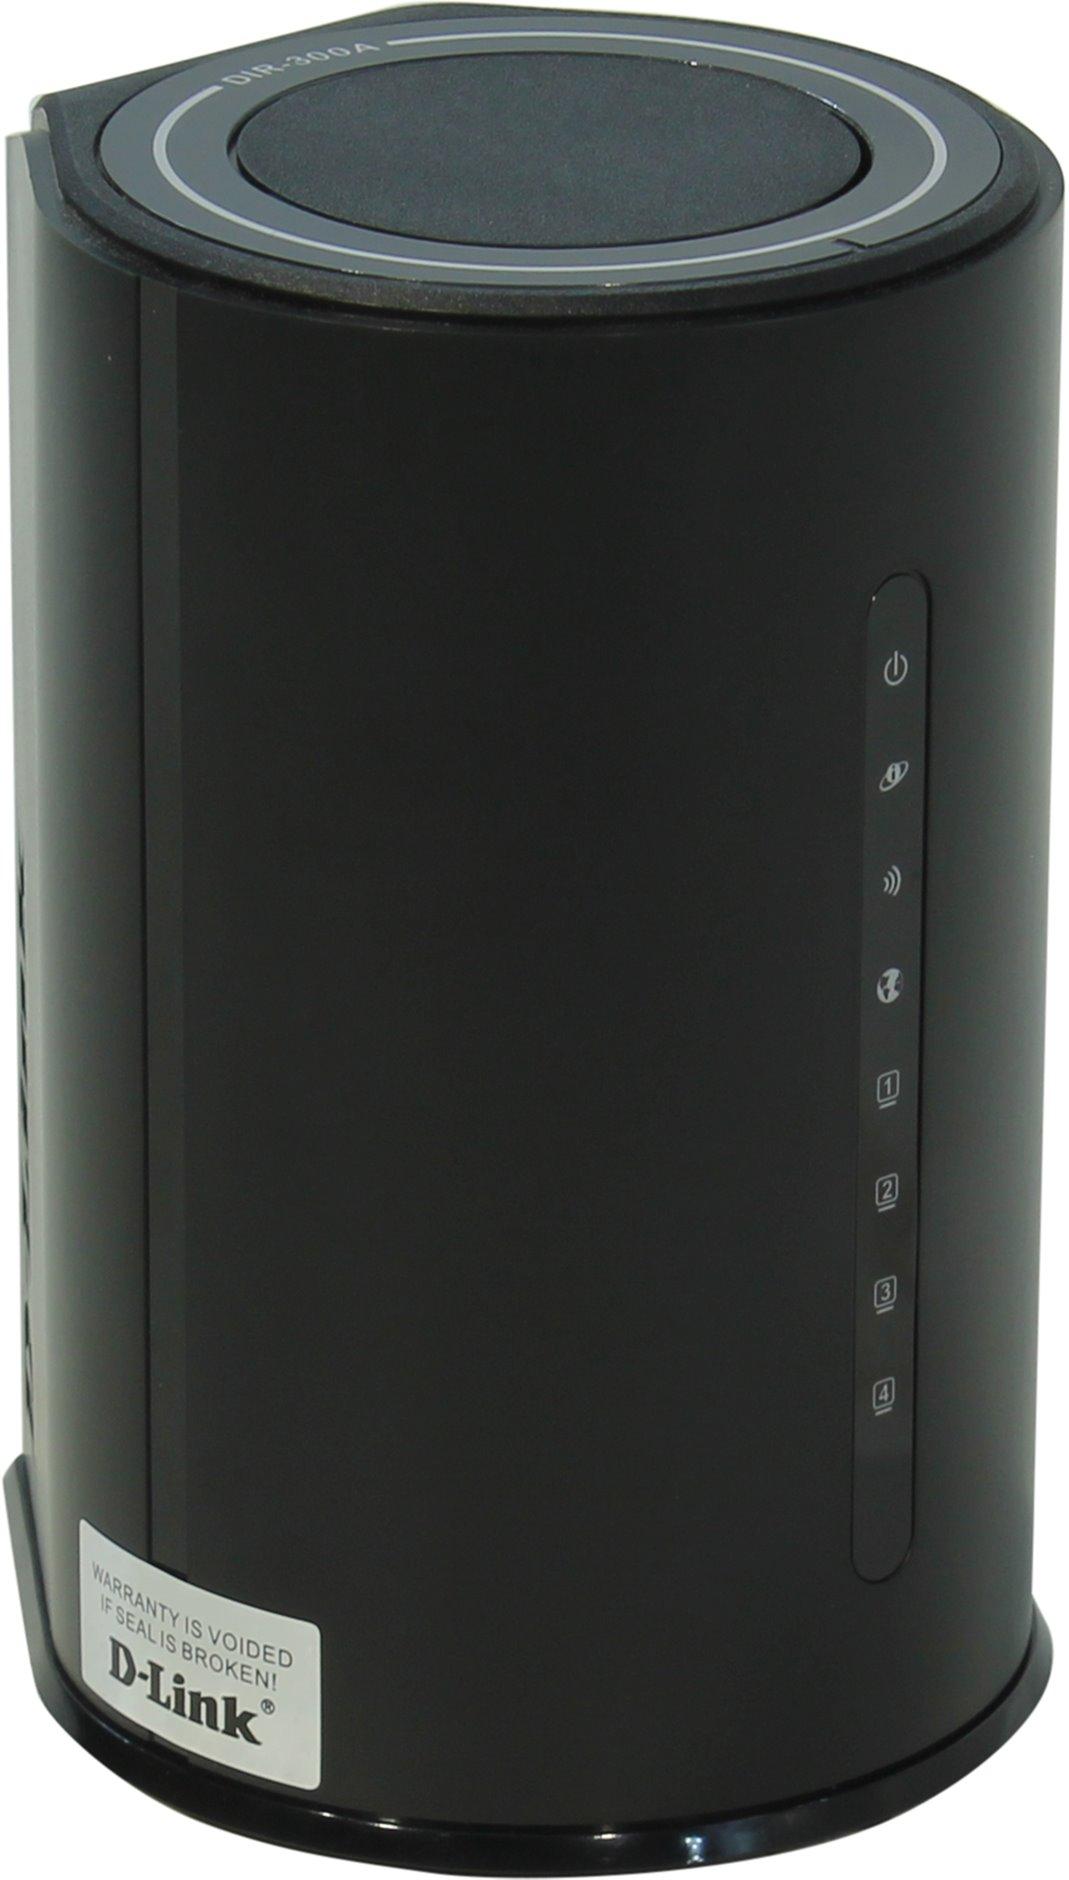 D-Link N150 (DIR-300A/A1A) - беспроводной маршрутизатор (Black)